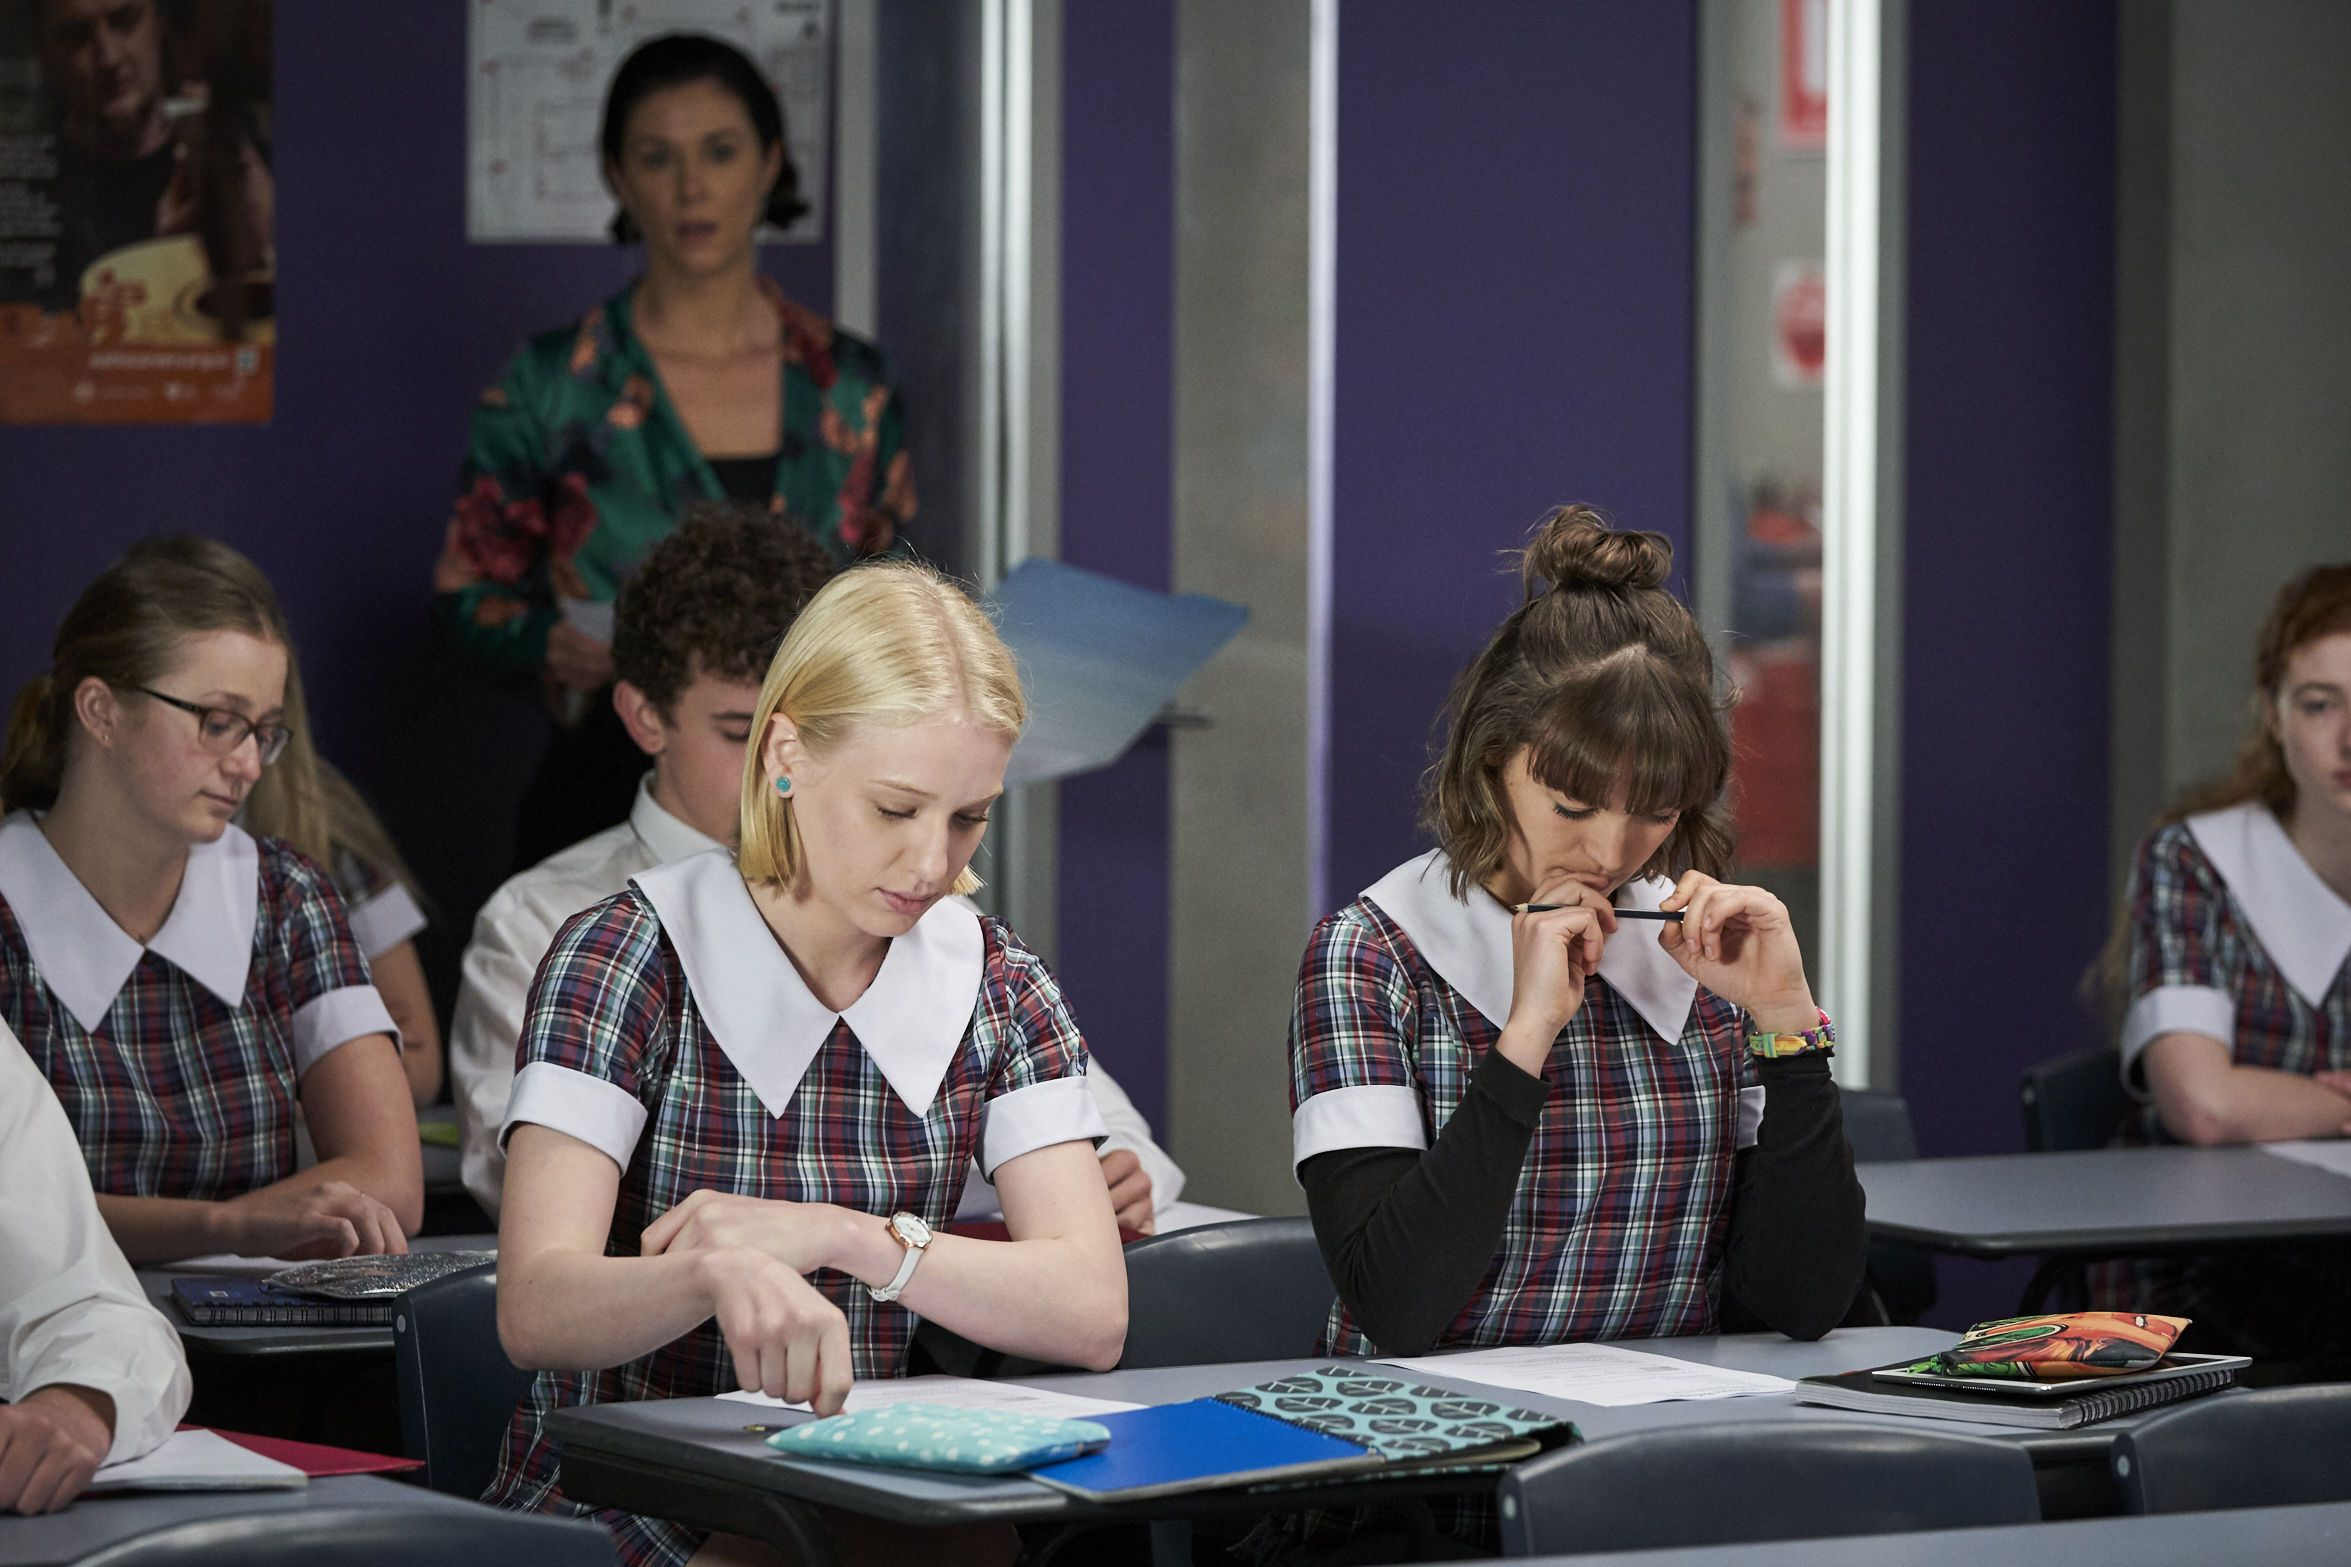 Bella Nixon struggles at school in Home and Away